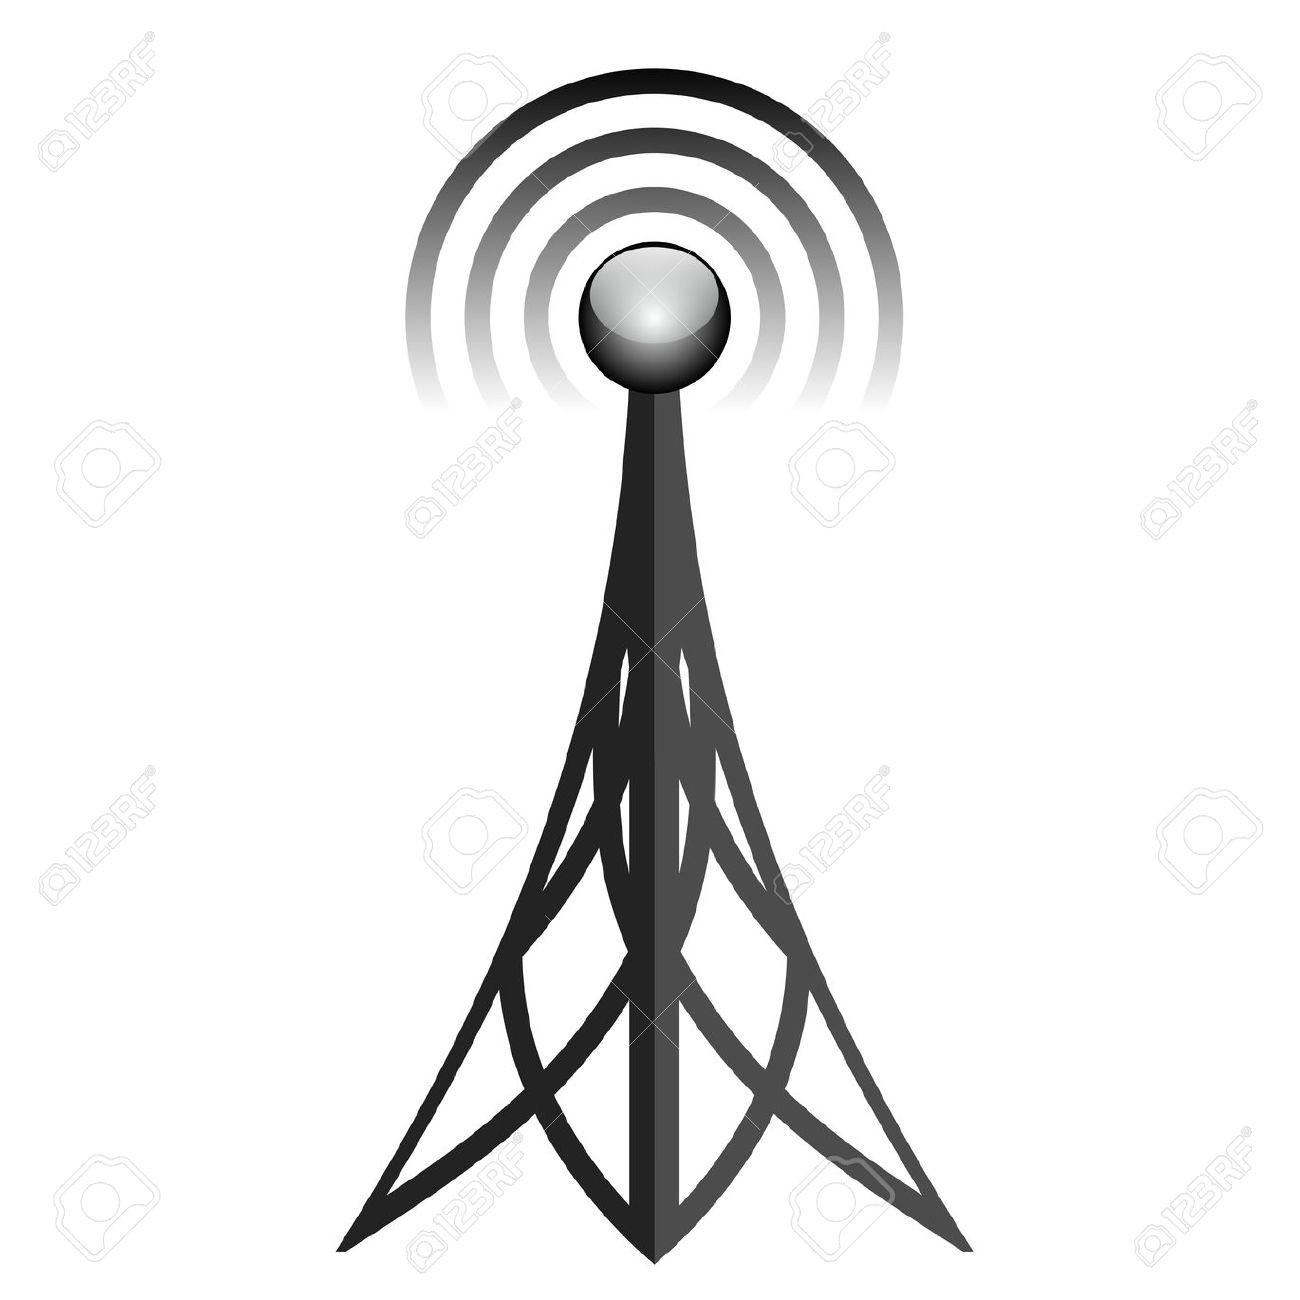 Antenna Pole Clipart Clipground